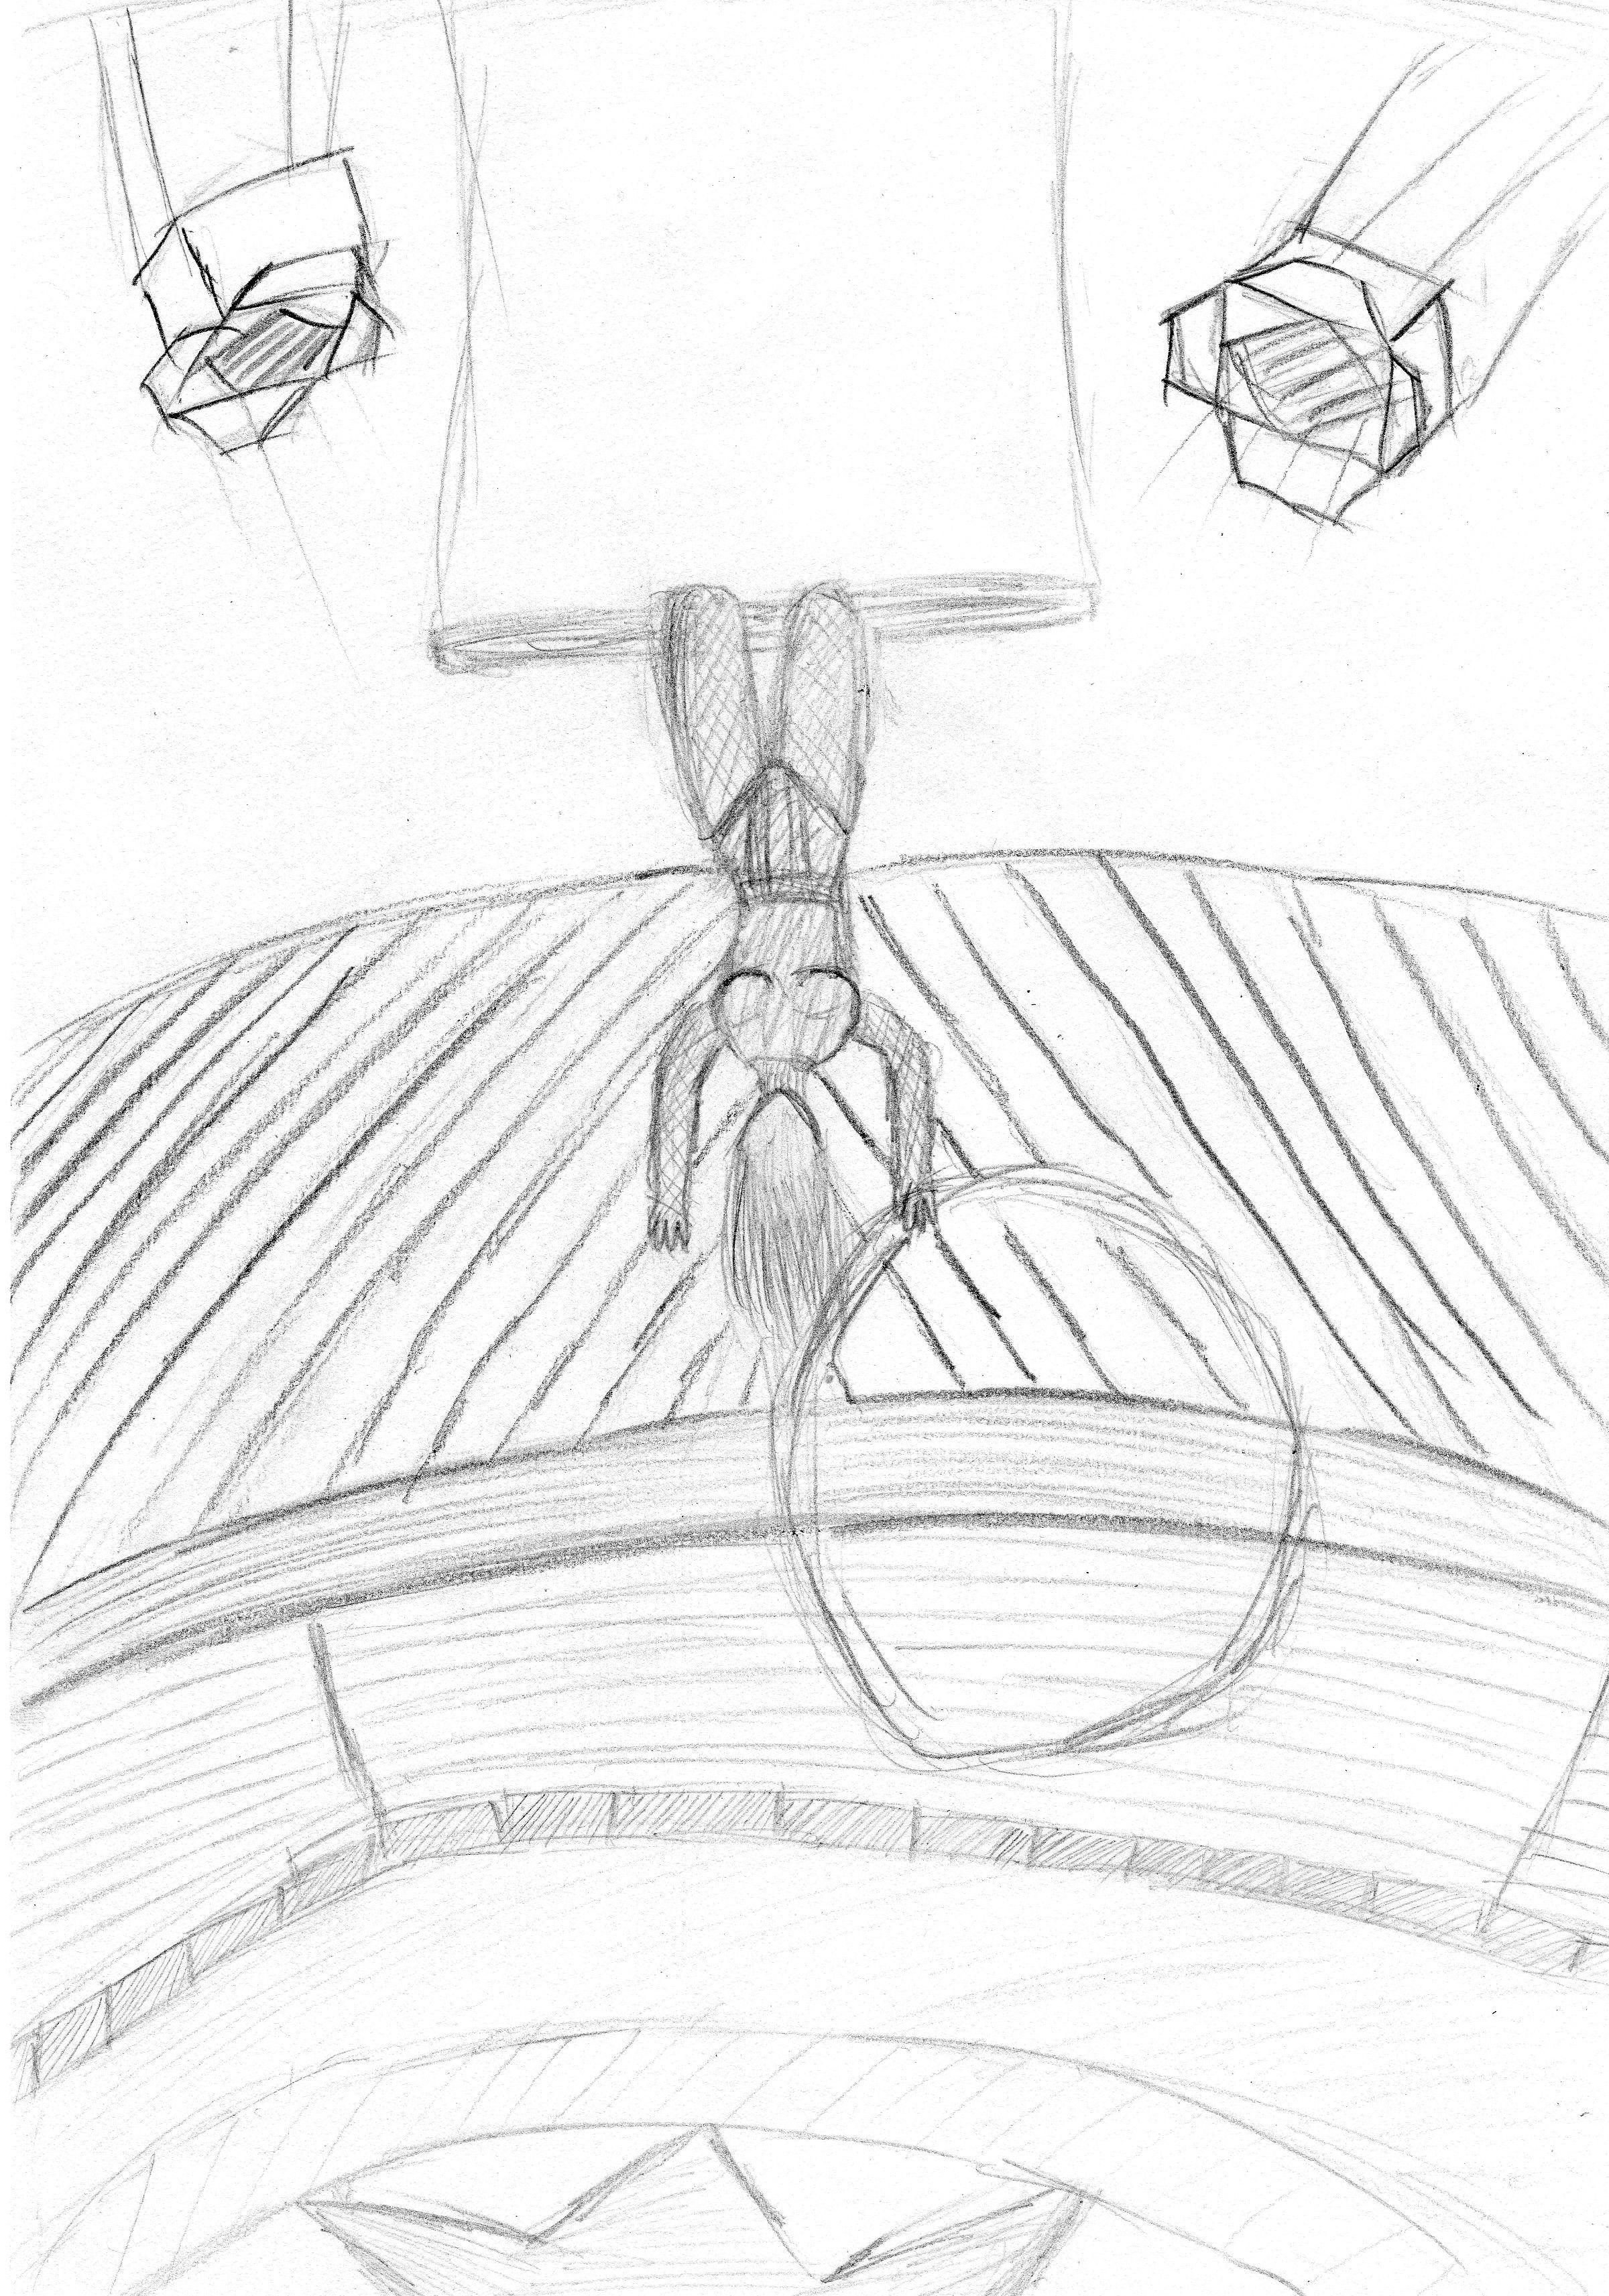 1 2 Dibujo Lineal Dibujo Lineal Hecho A Mano Alzada Con Grafito Dibujo Lineal Artistas Dibujos Artisticos